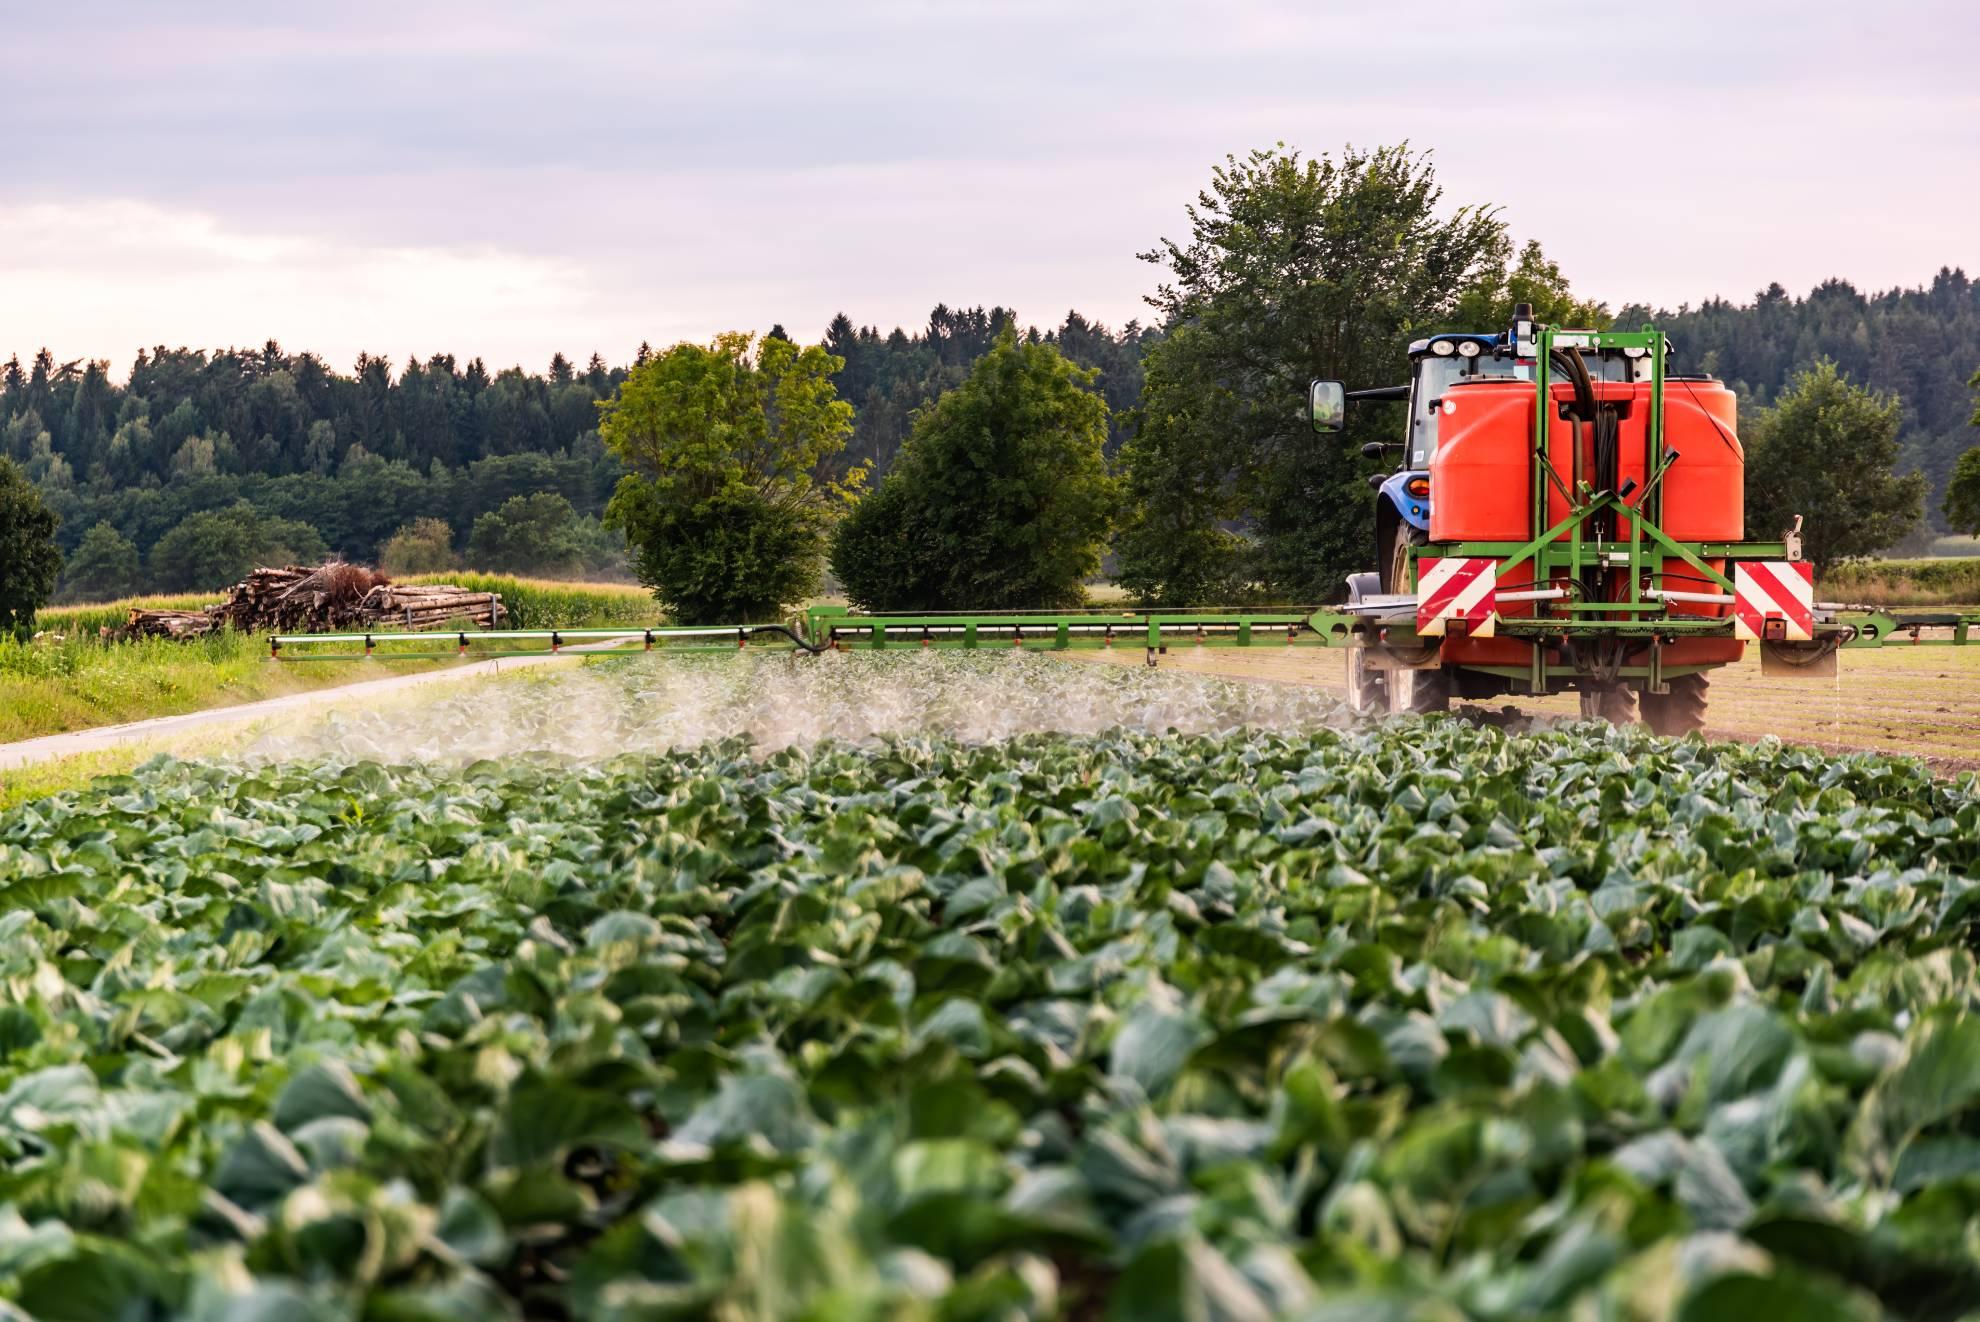 tractor-spraying-pesticides-on-cabbage-field-QMREFDZ (1)